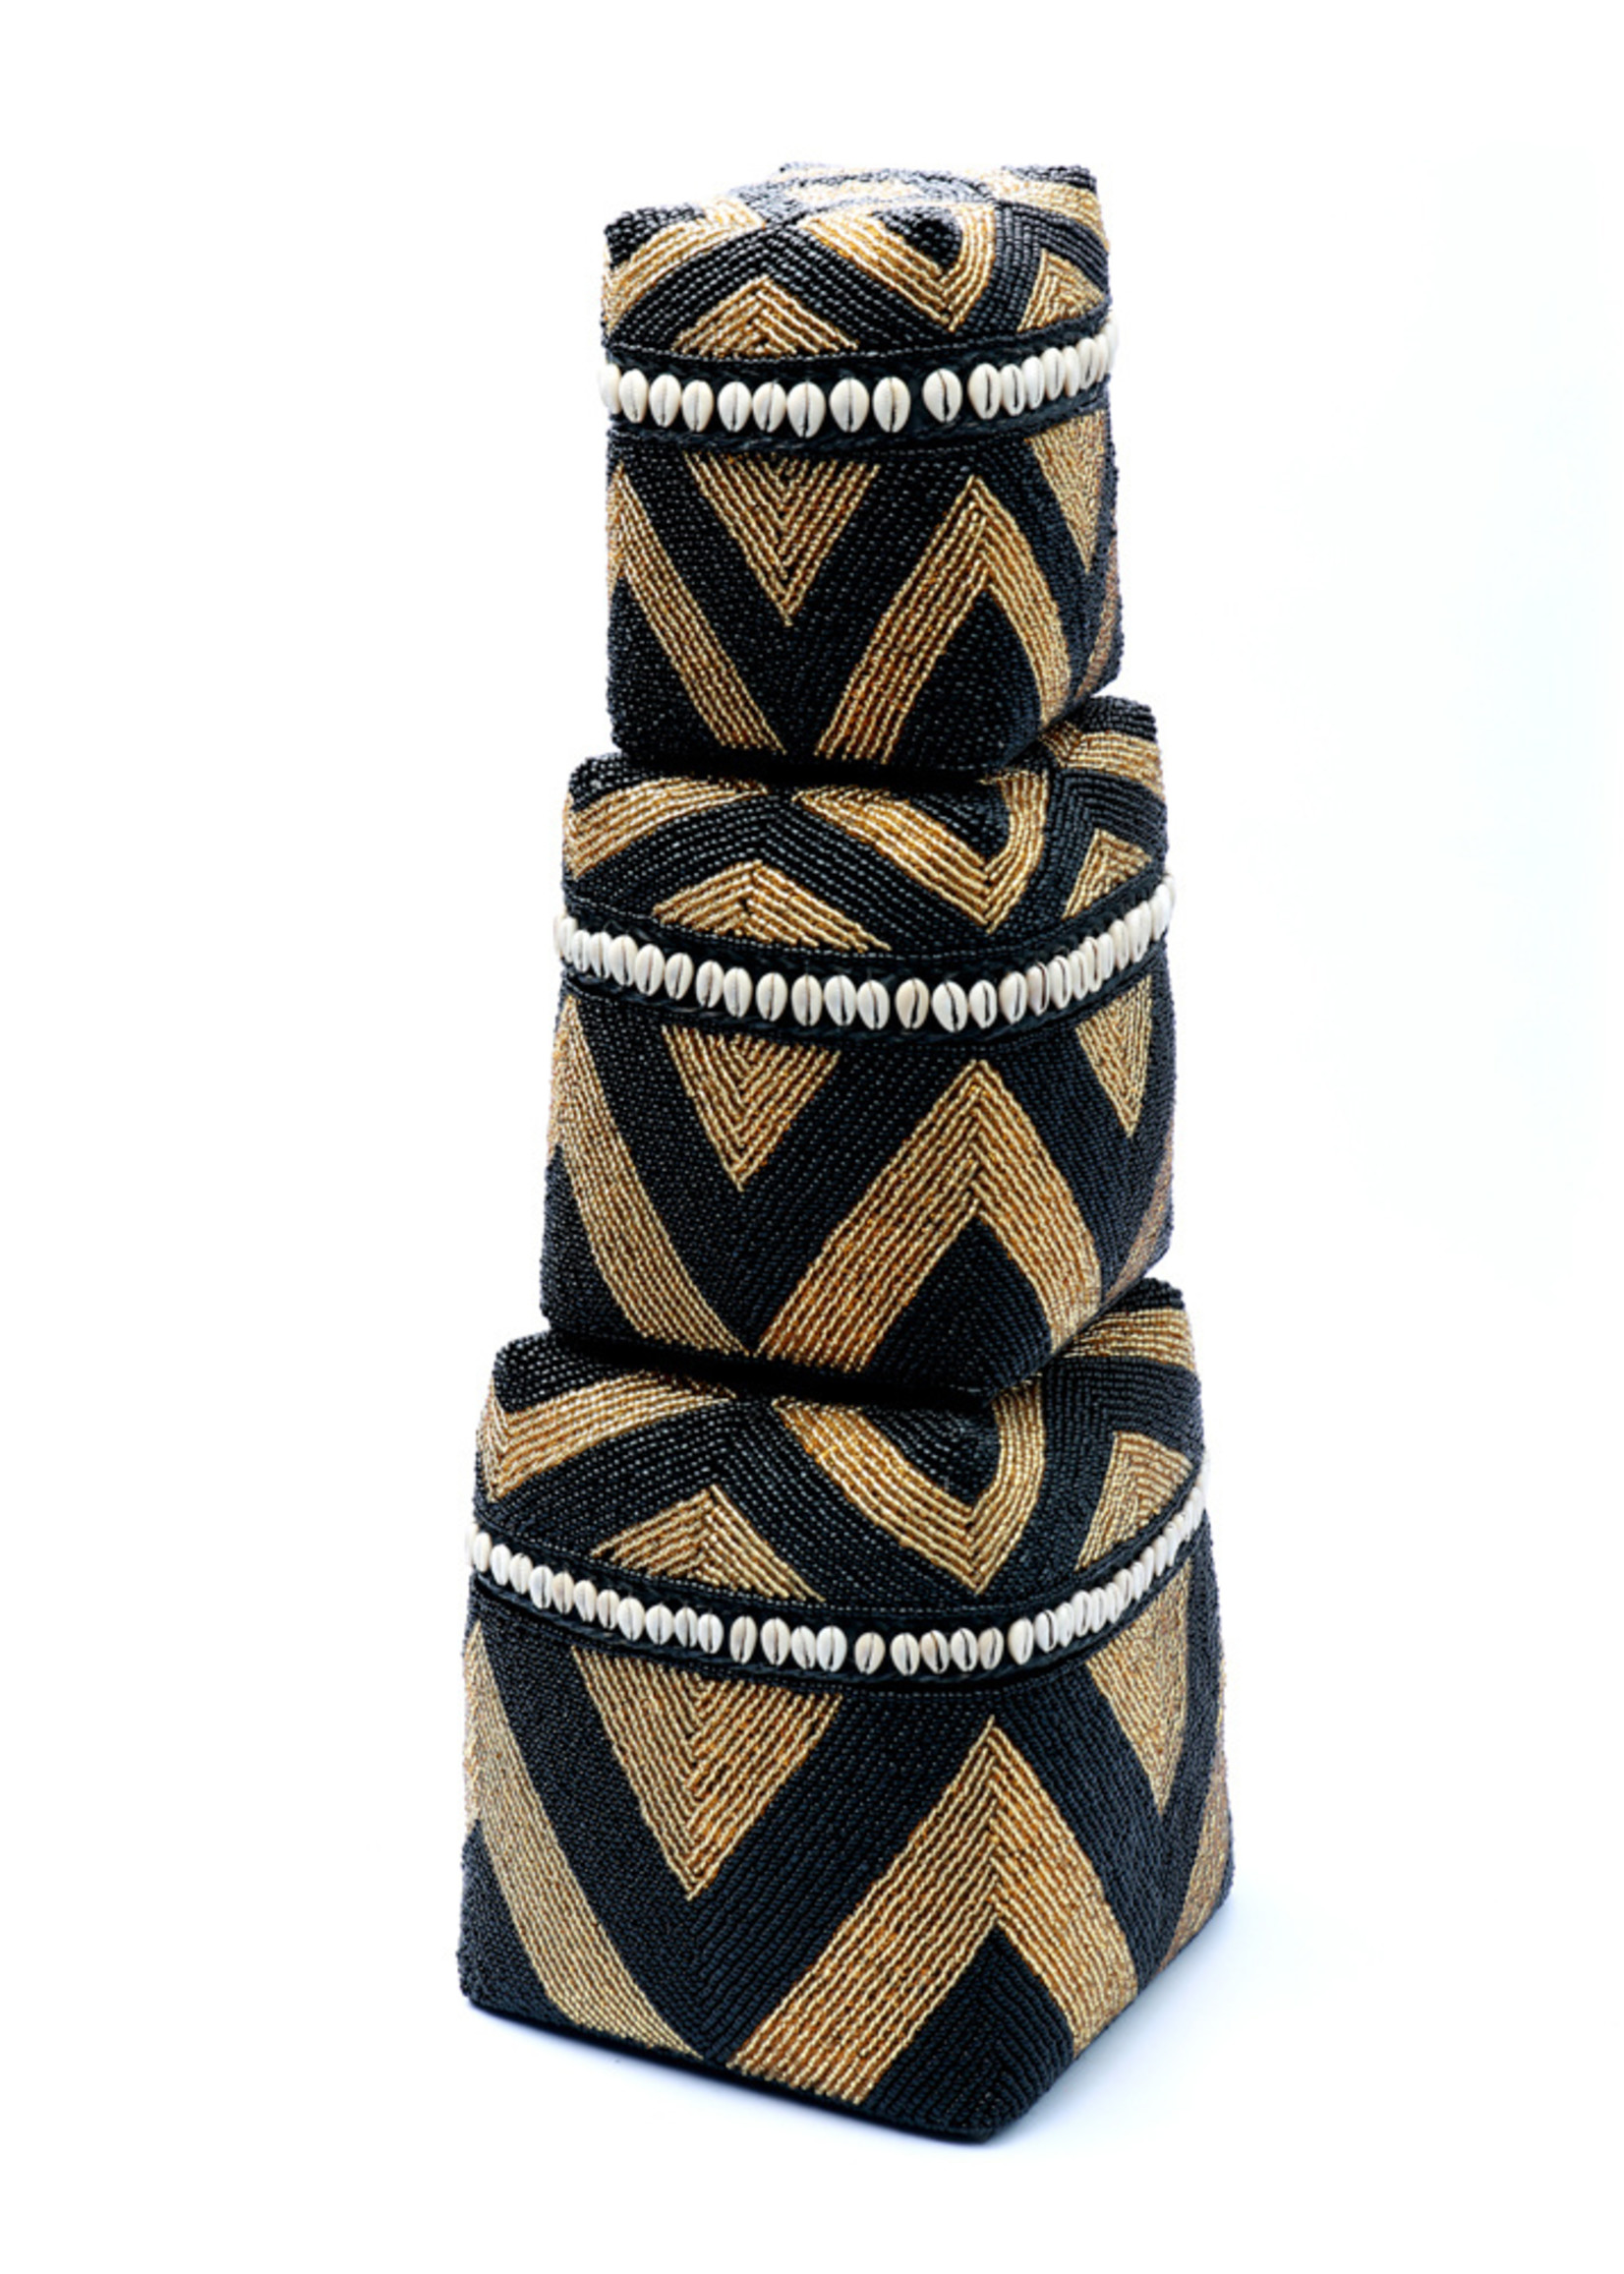 The Beaded Basket Cowrie Diamond High - Black Gold - SET3